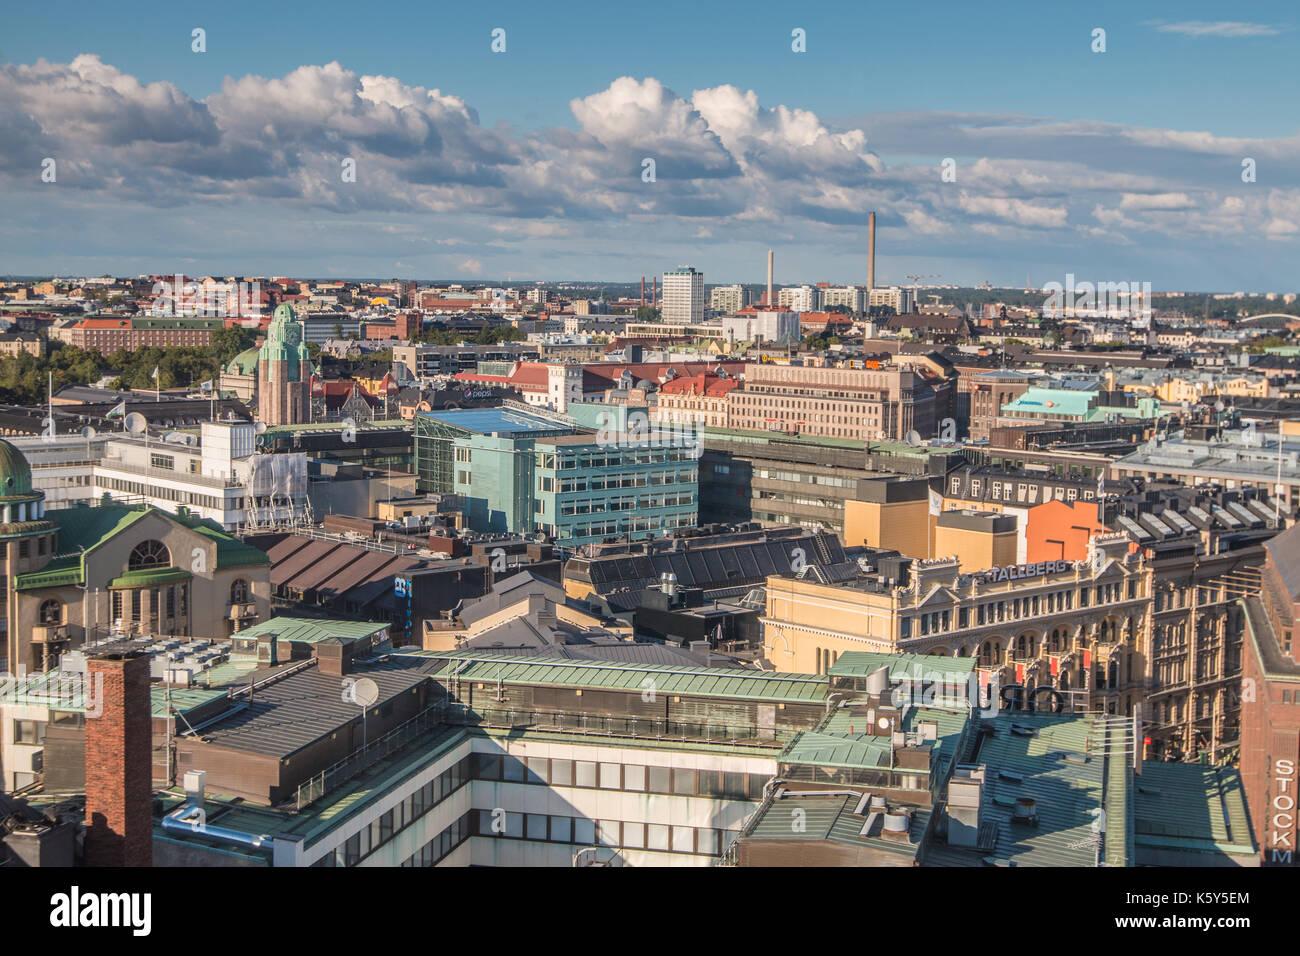 Helsinki Finland - Stock Image